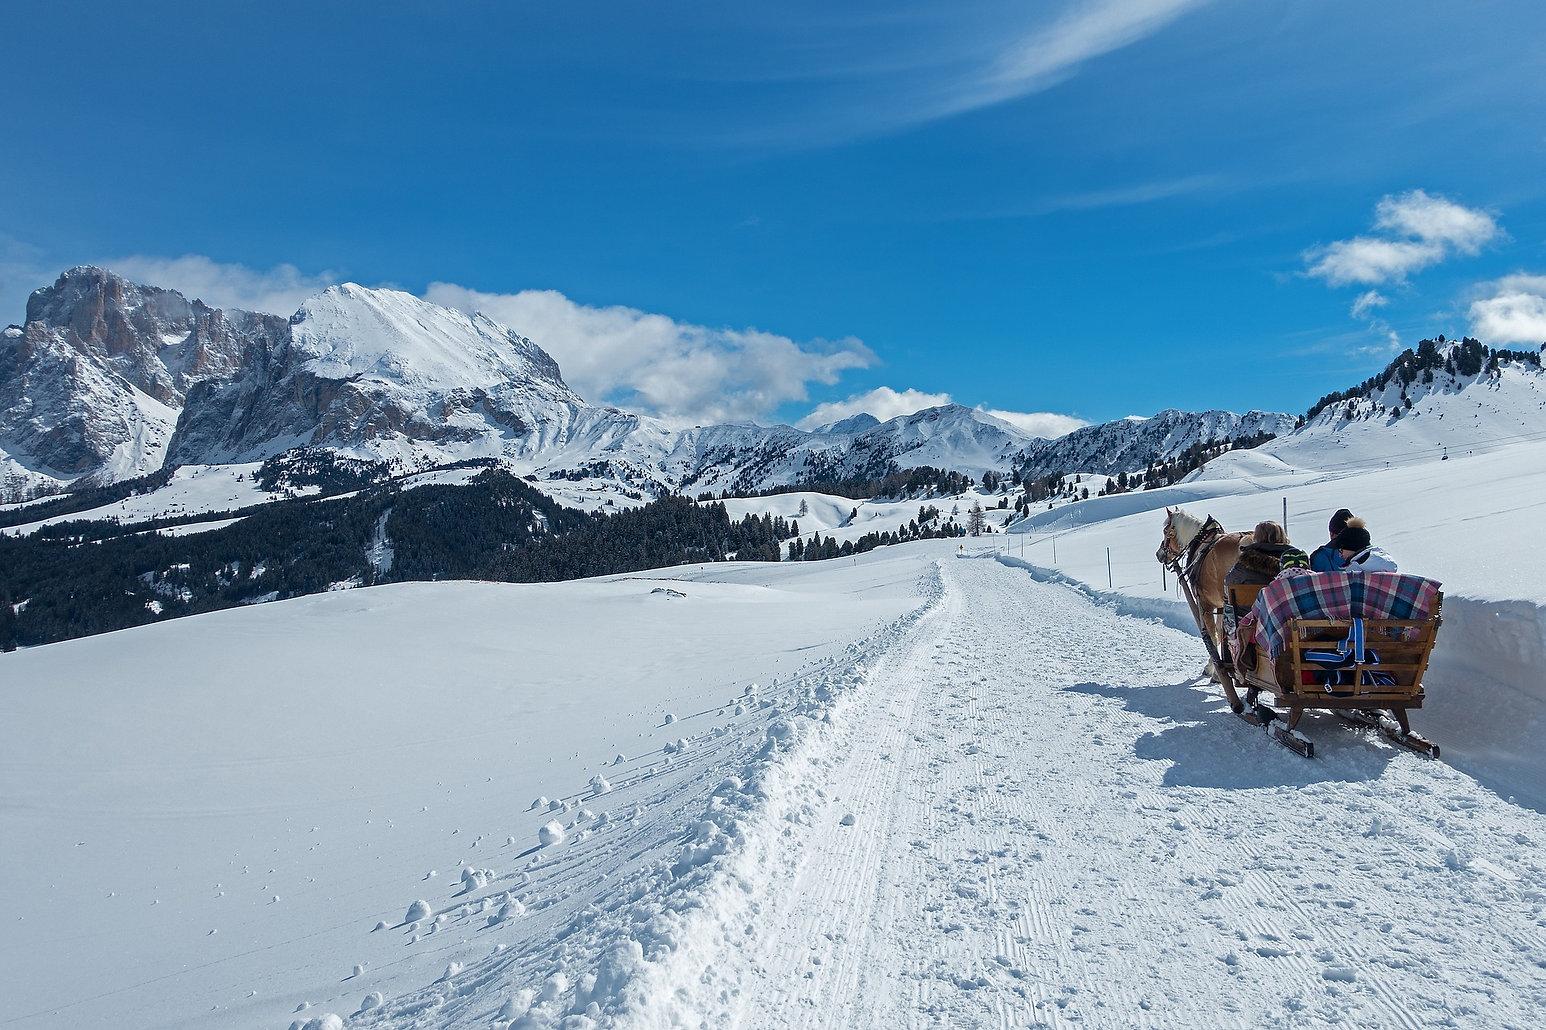 voyages adaptés hiver.jpg